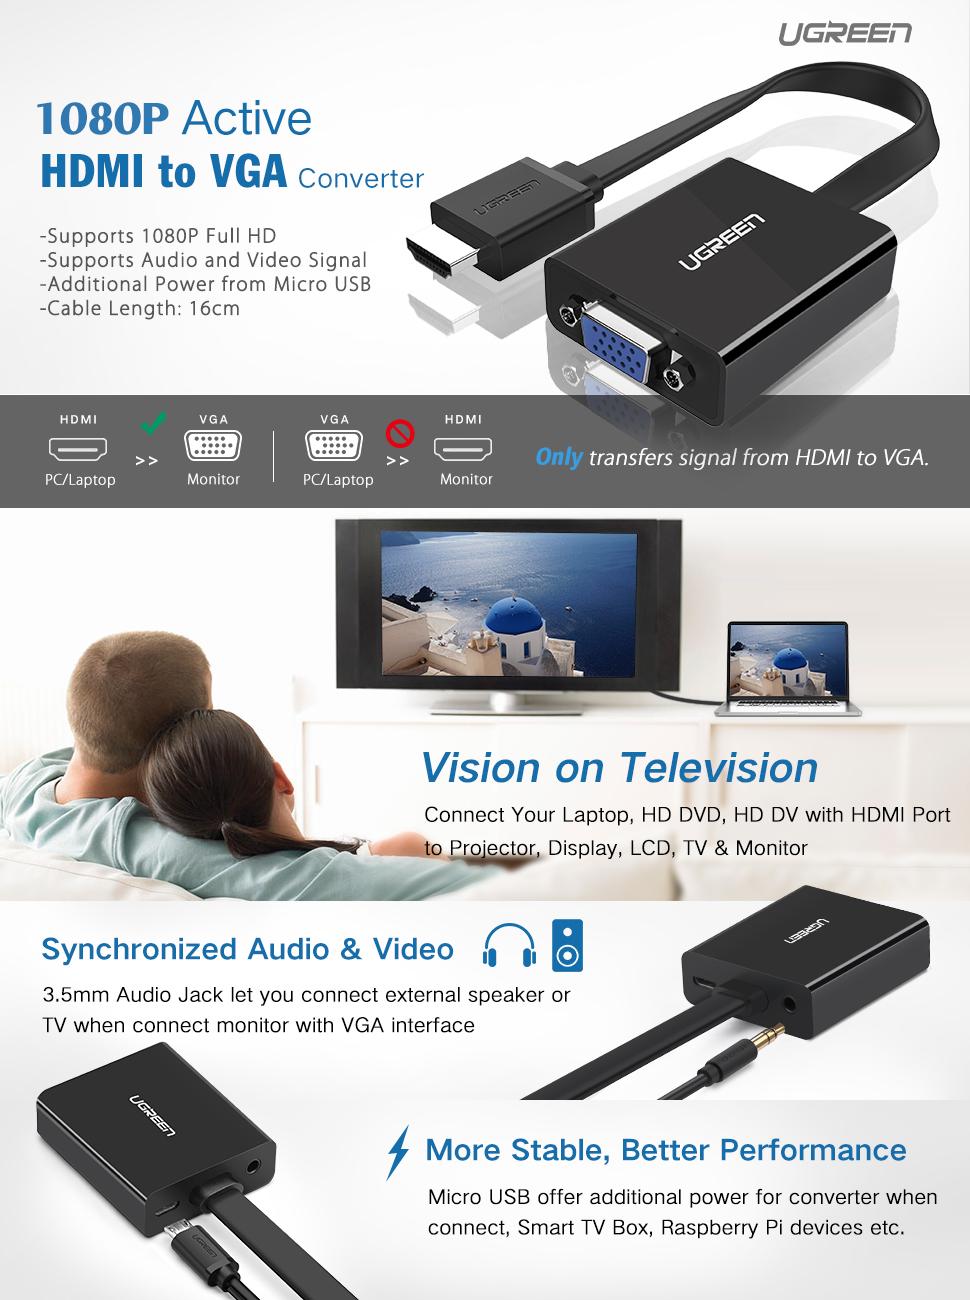 HDMI to VGA Adapter, UGREEN 1080P Active HDMI to VGA Converter with ...